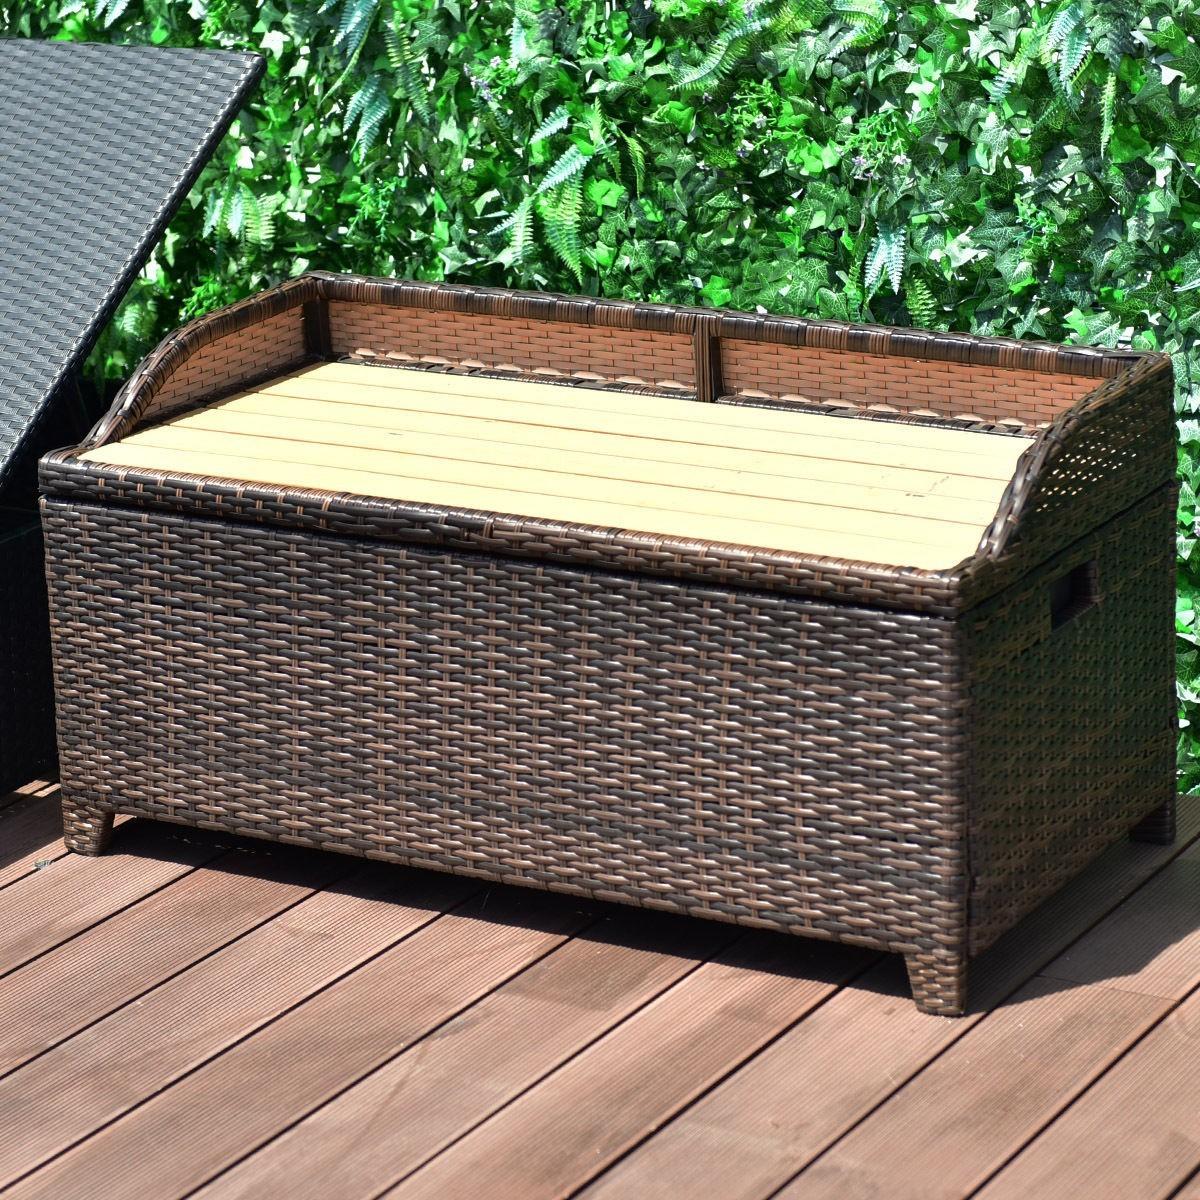 50 Gallon Patio Garden Rattan Wicker Storage Bench